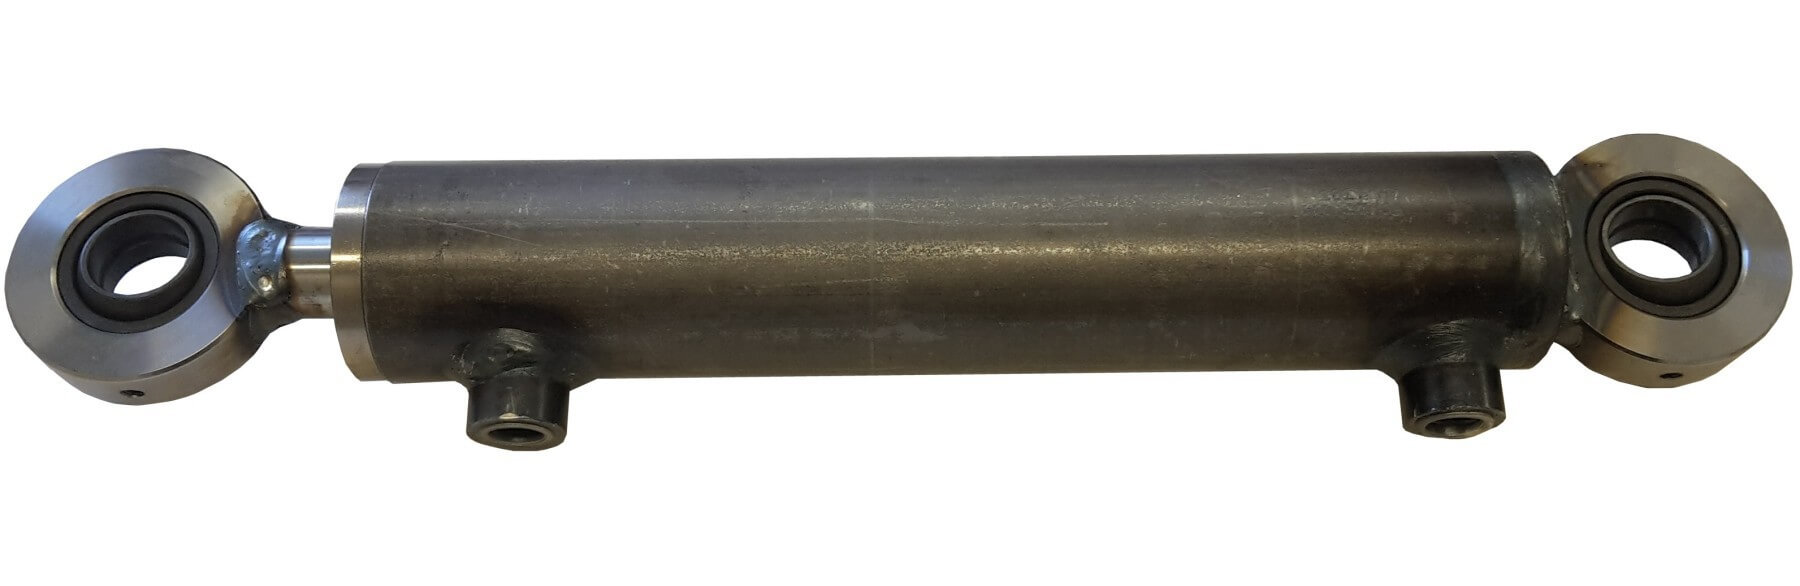 Hydraulisylinteri CL 50. 30. 500 GE